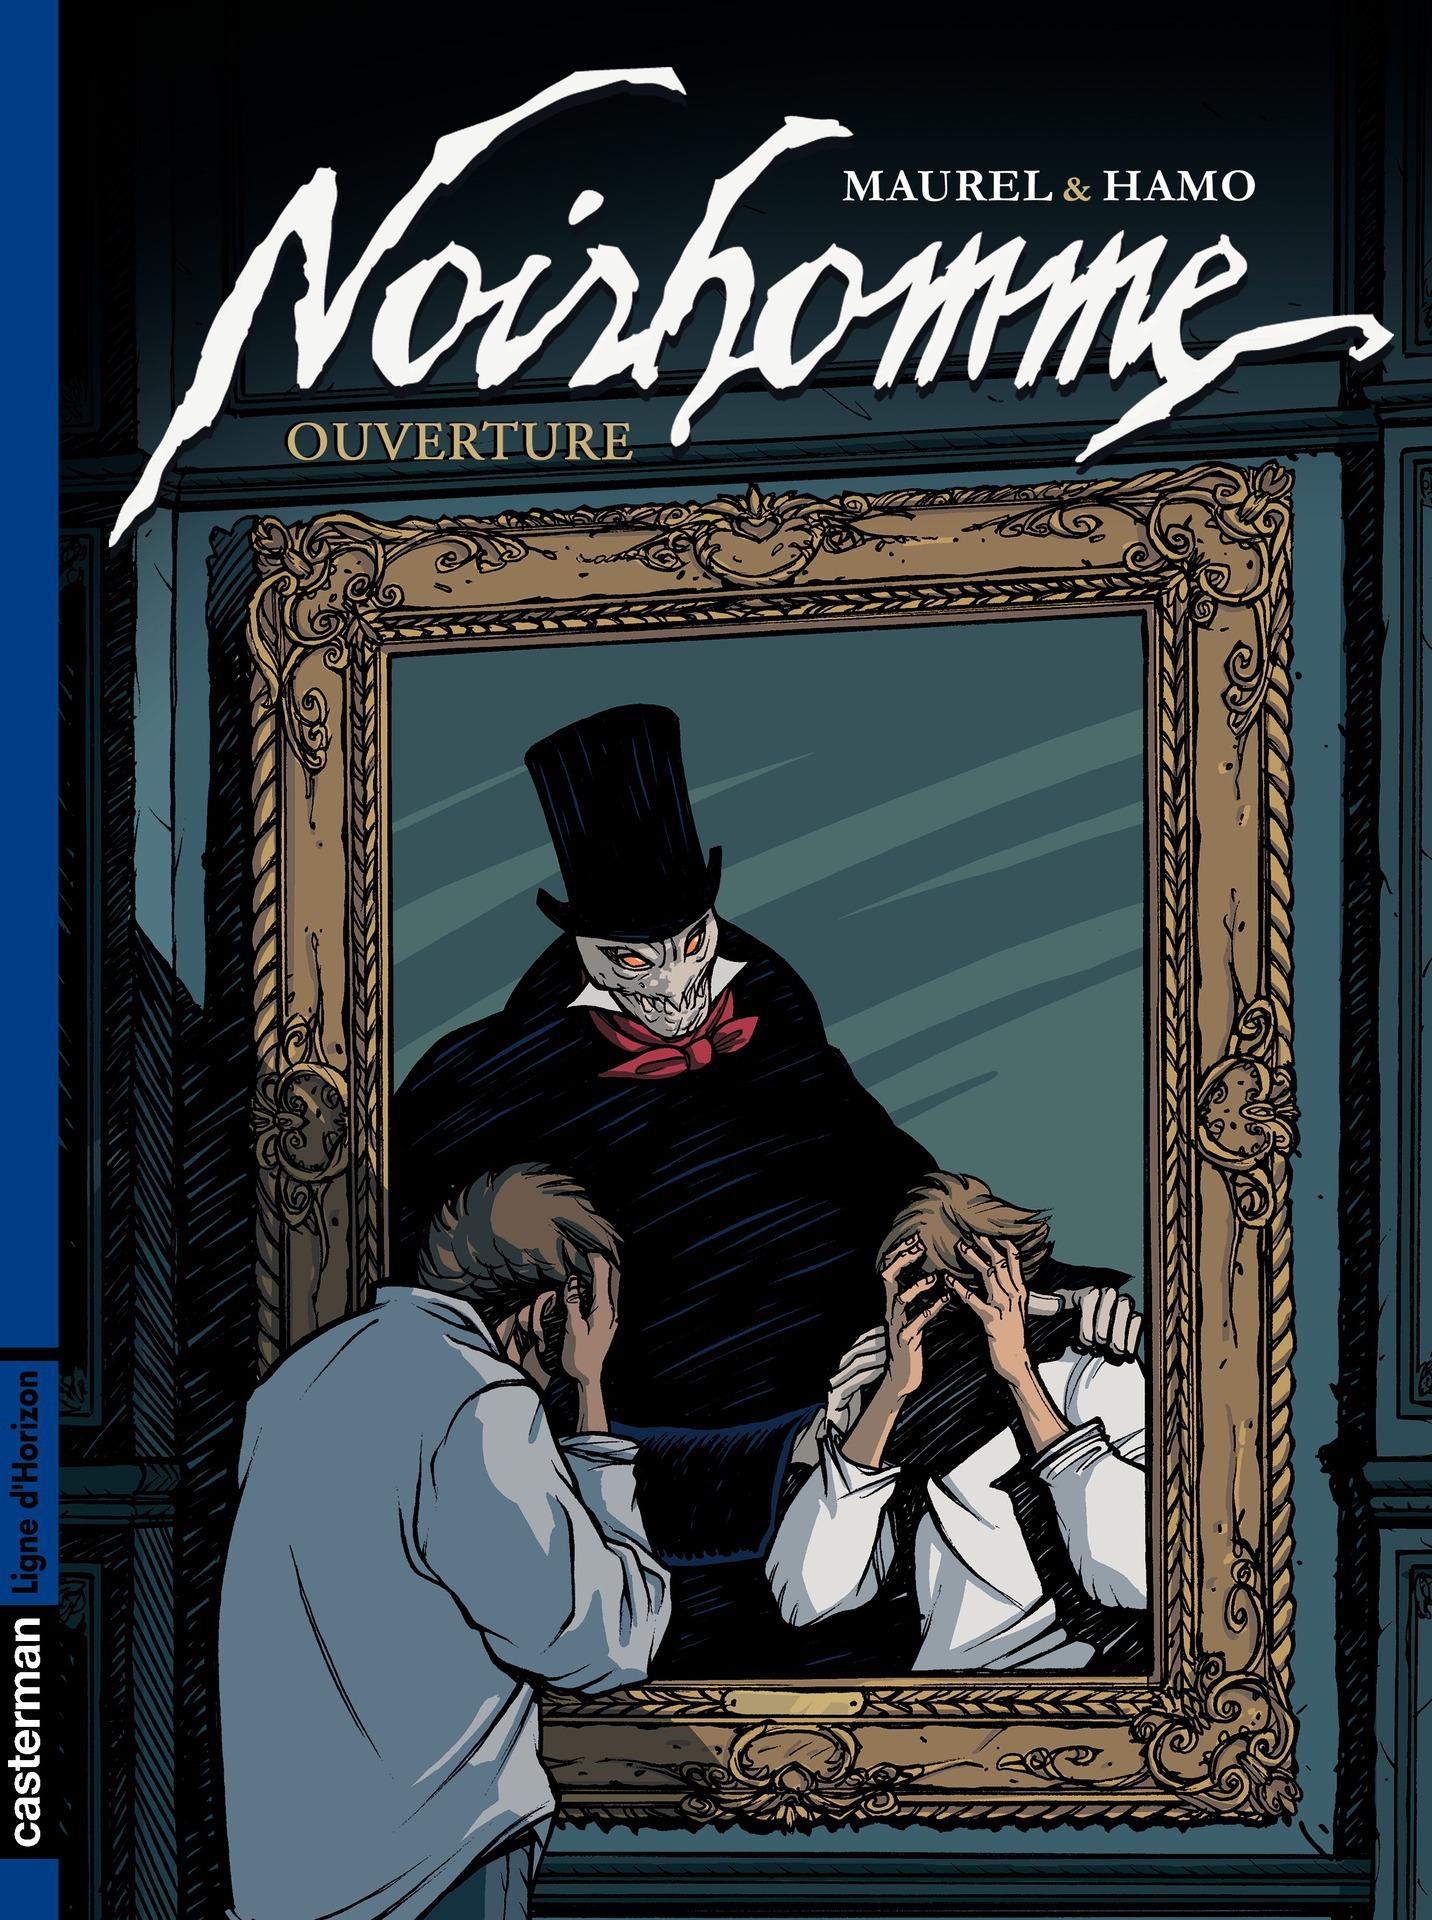 Noirhomme (Tome 1) - Ouverture